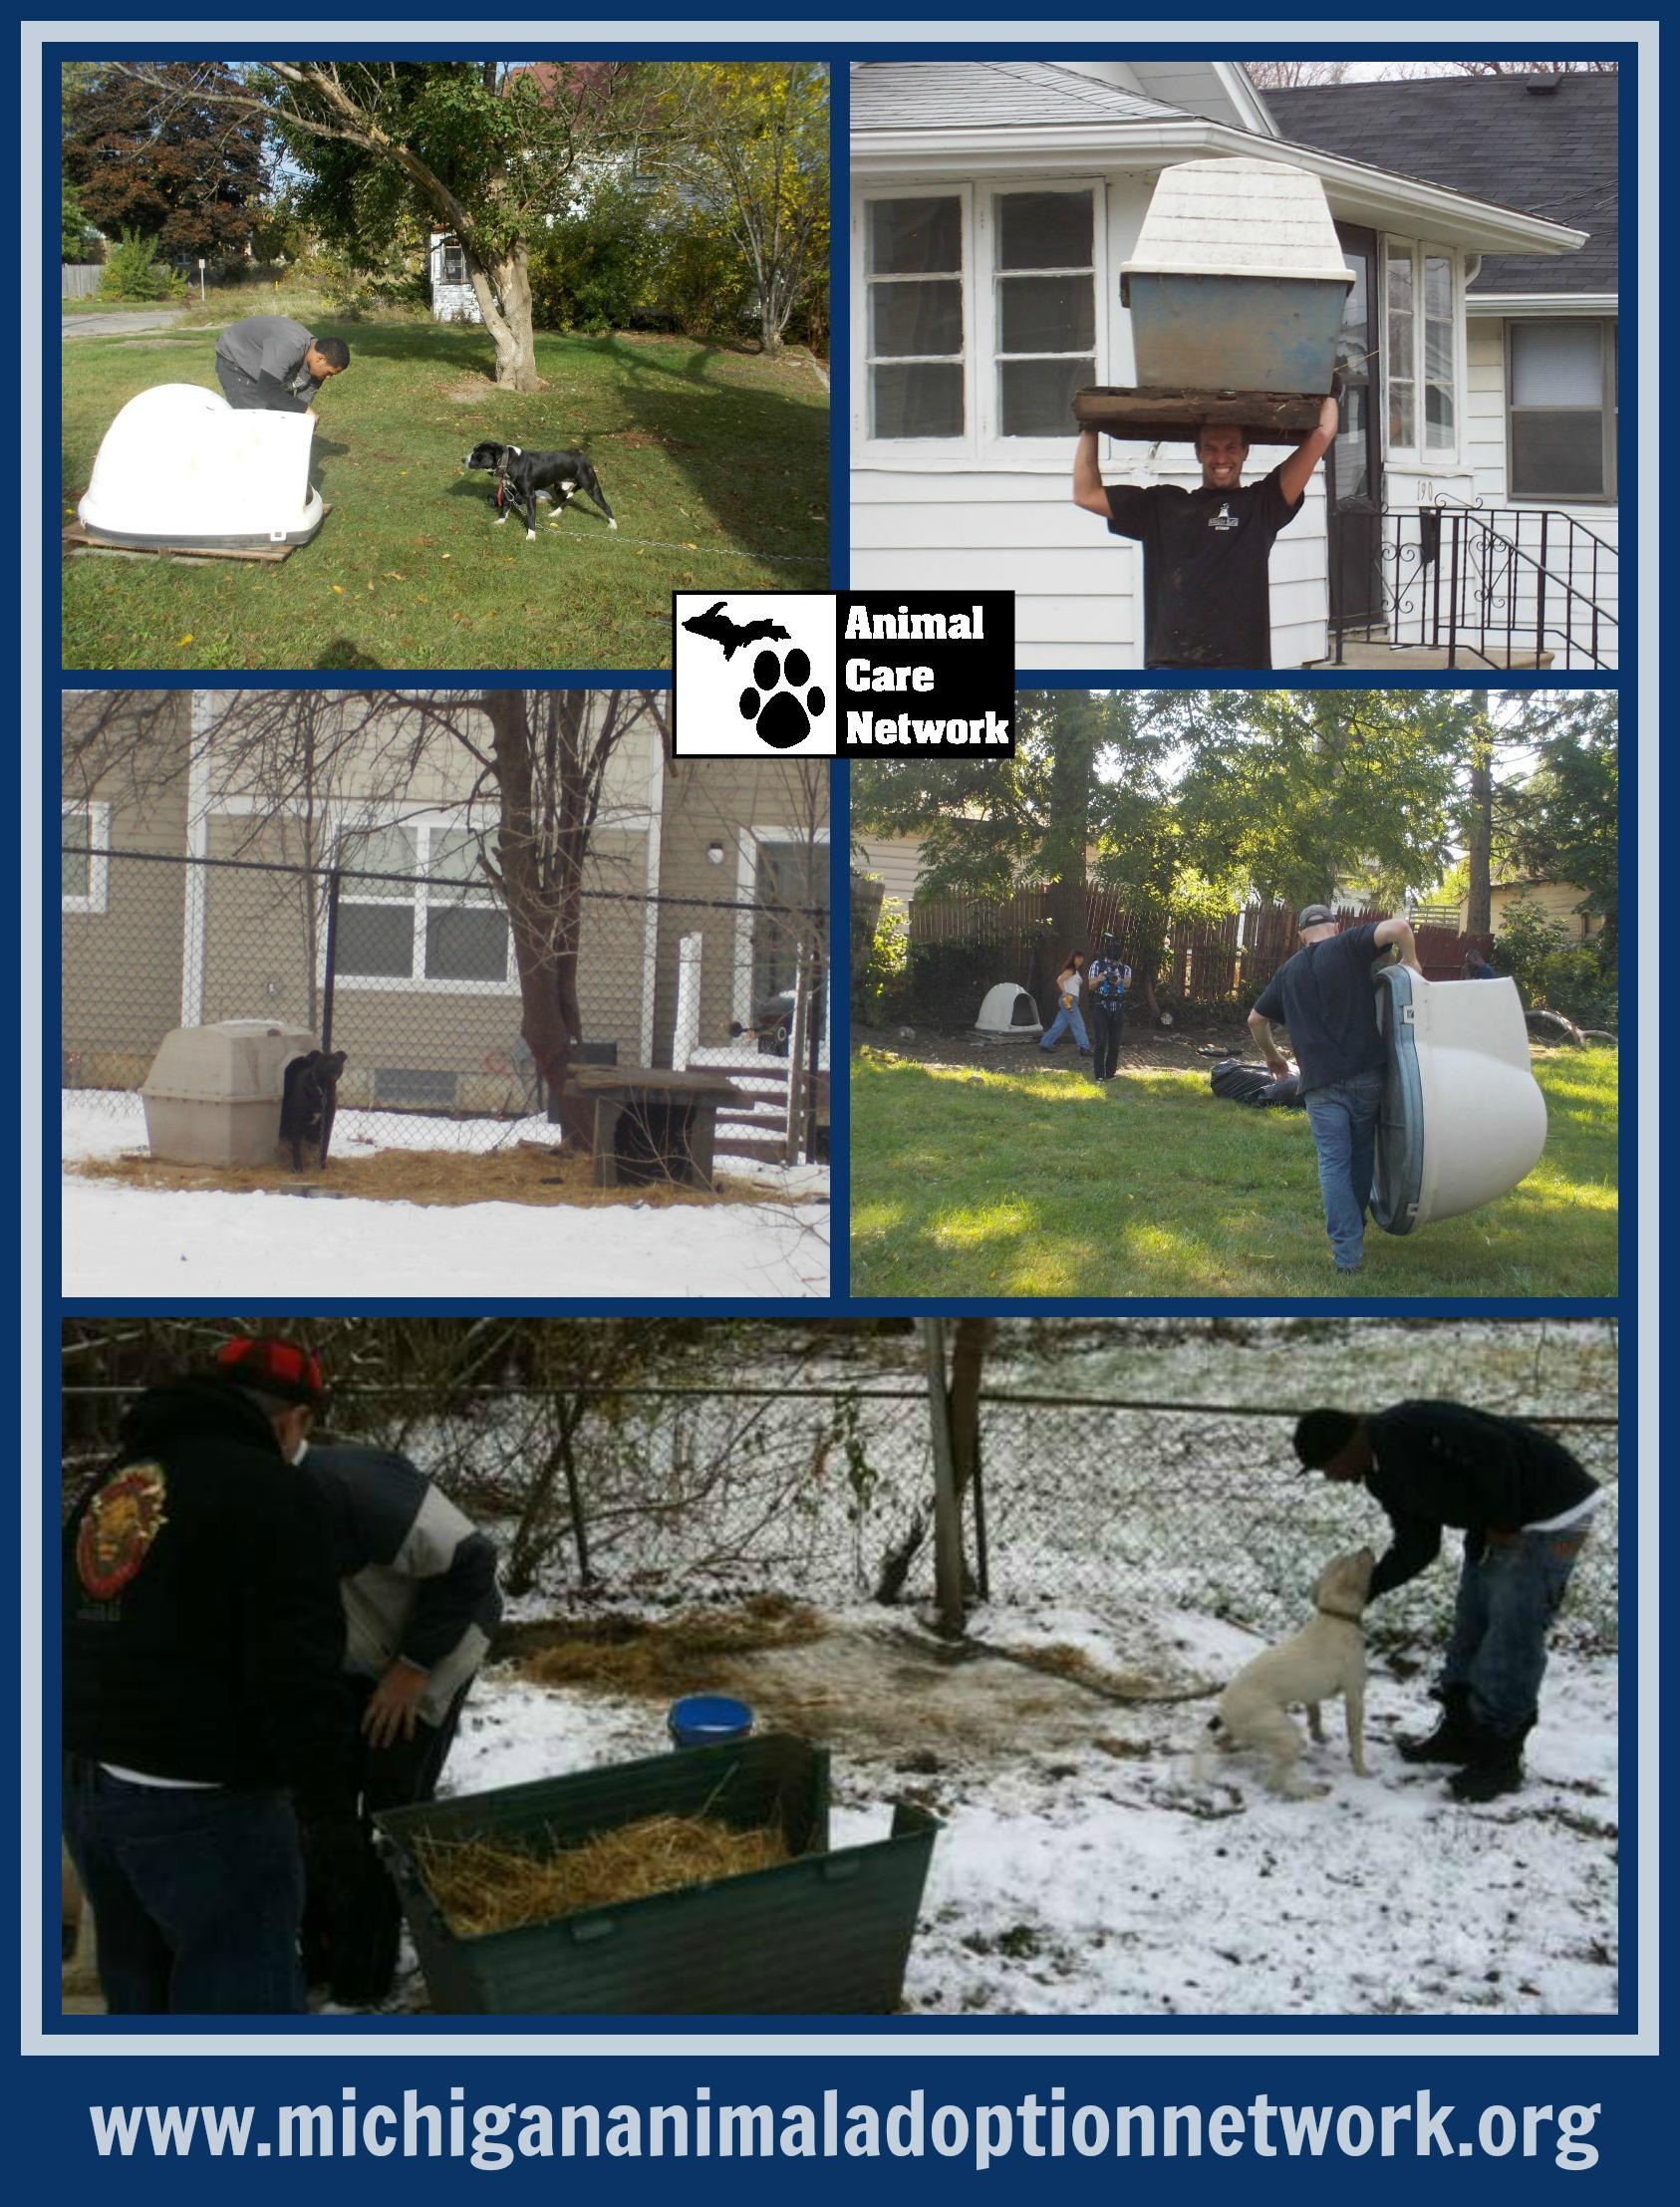 January 16 2014 PicMonkey Collage